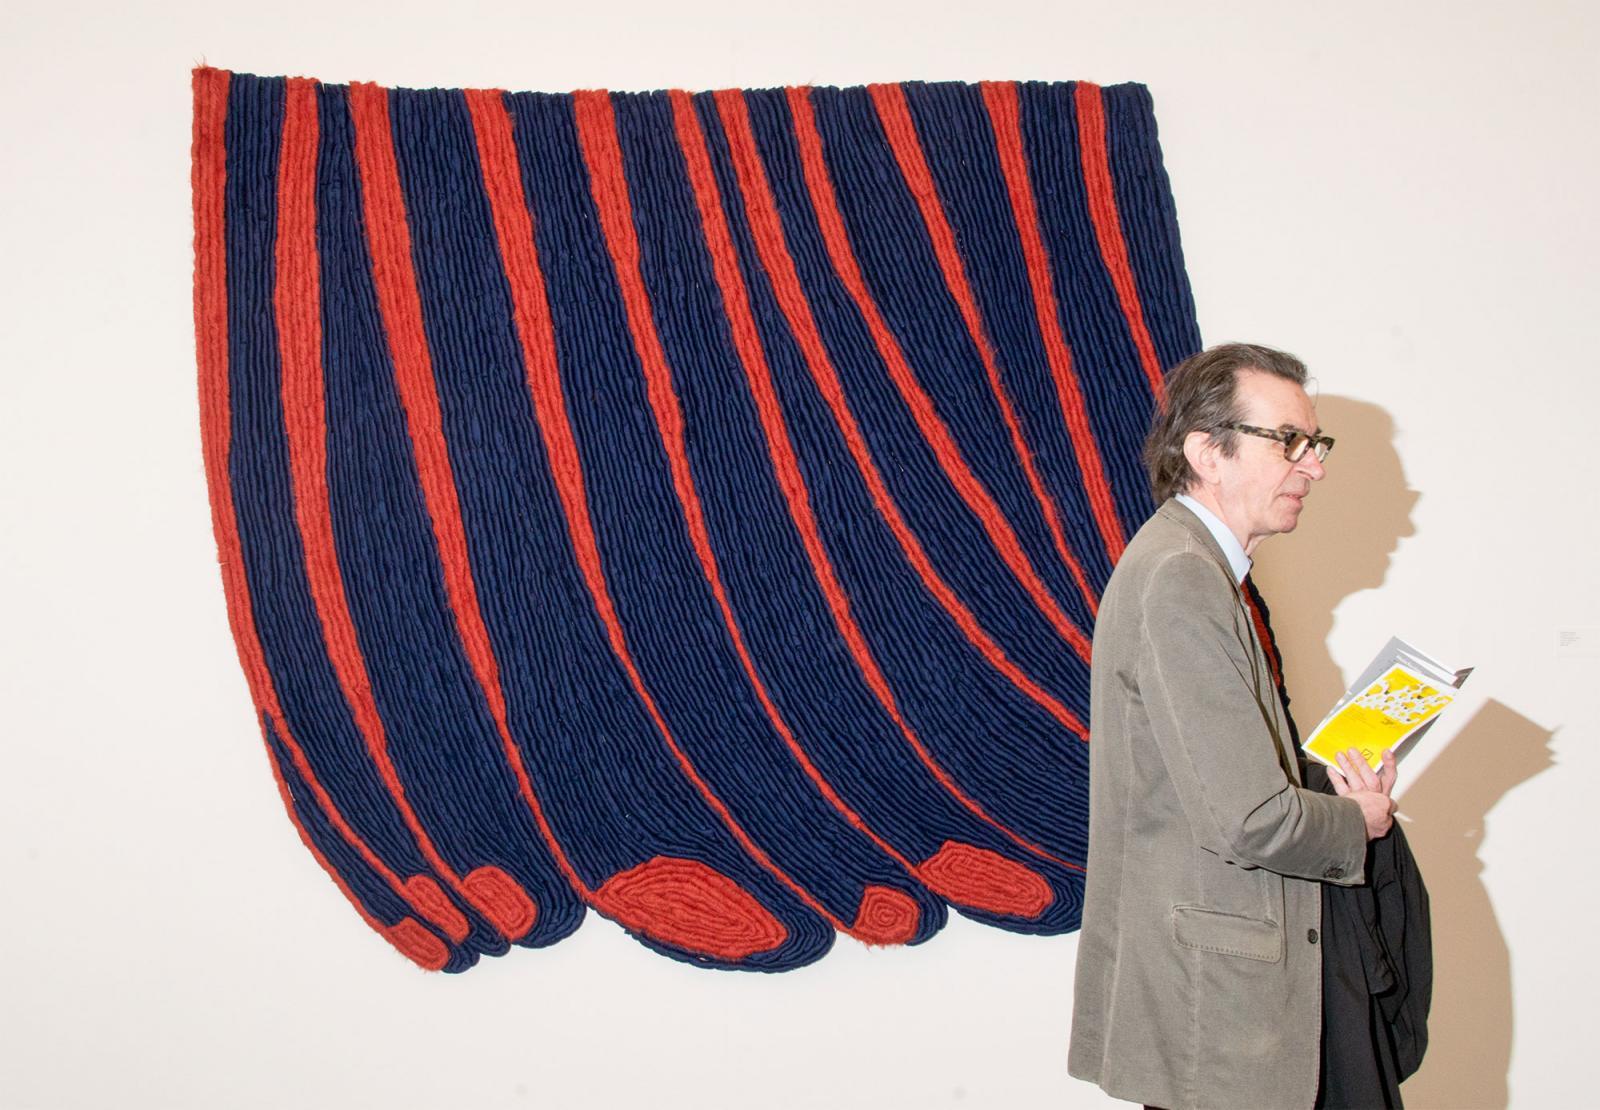 Enrico David at Michael Werner